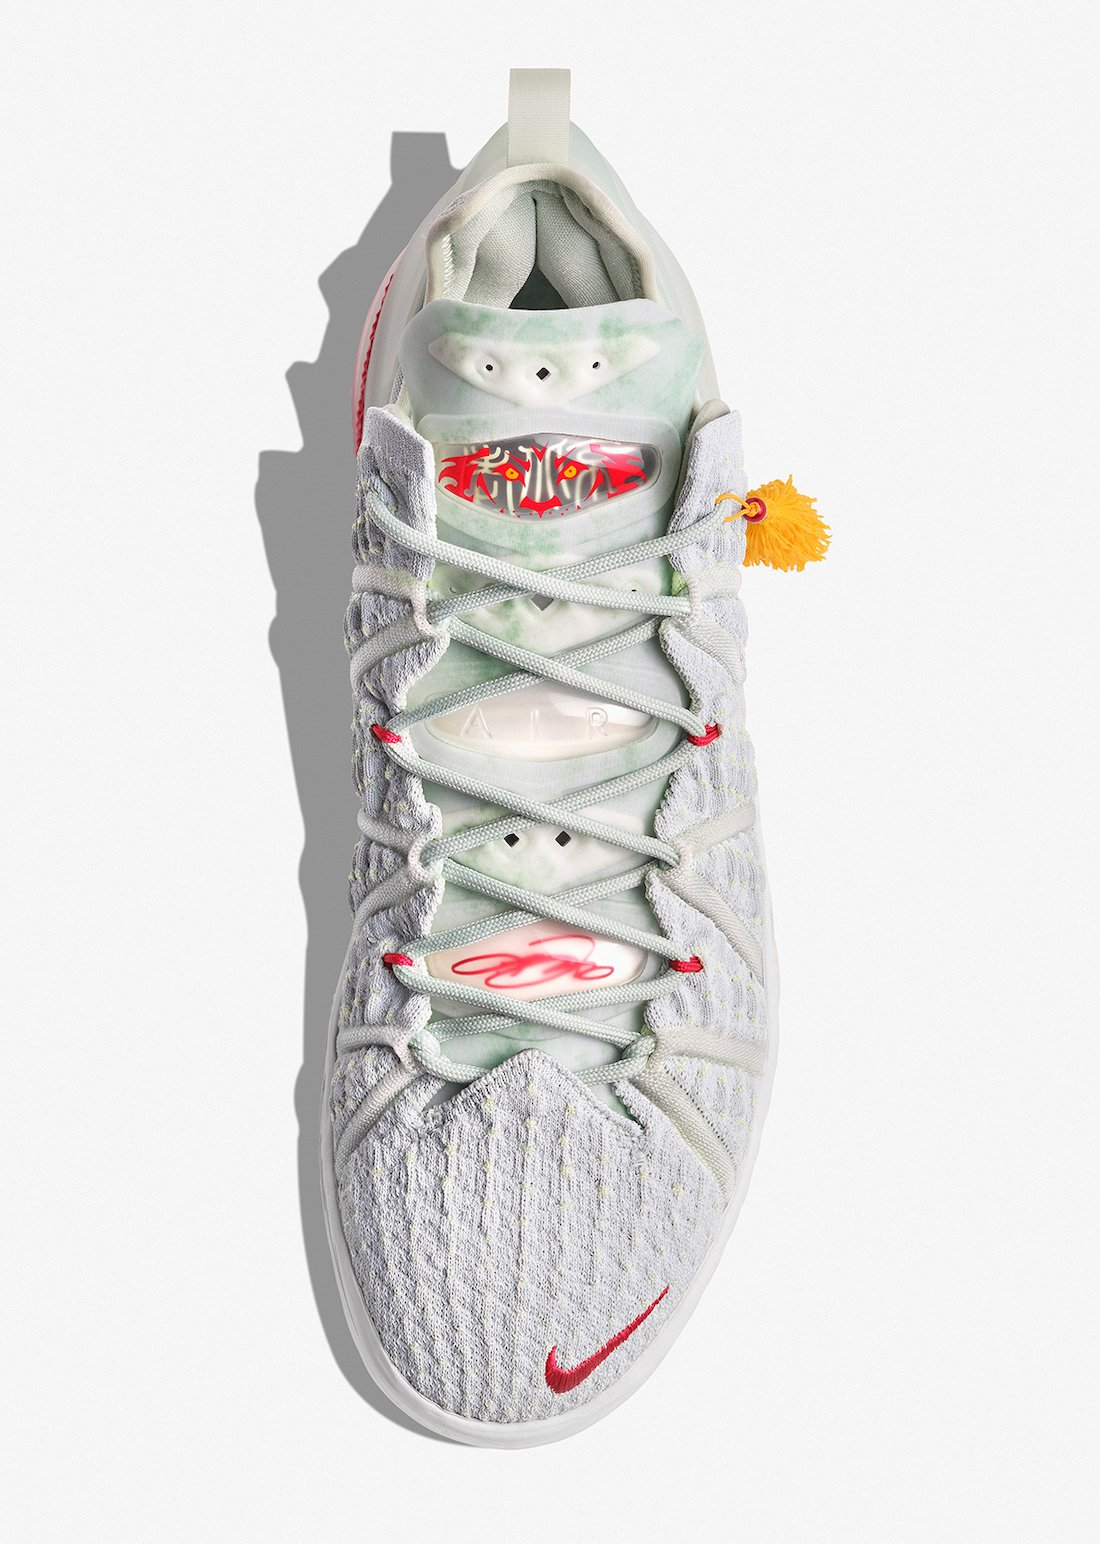 Nike Lebron 18 Colorways Release Dates Pricing Sneakerfiles